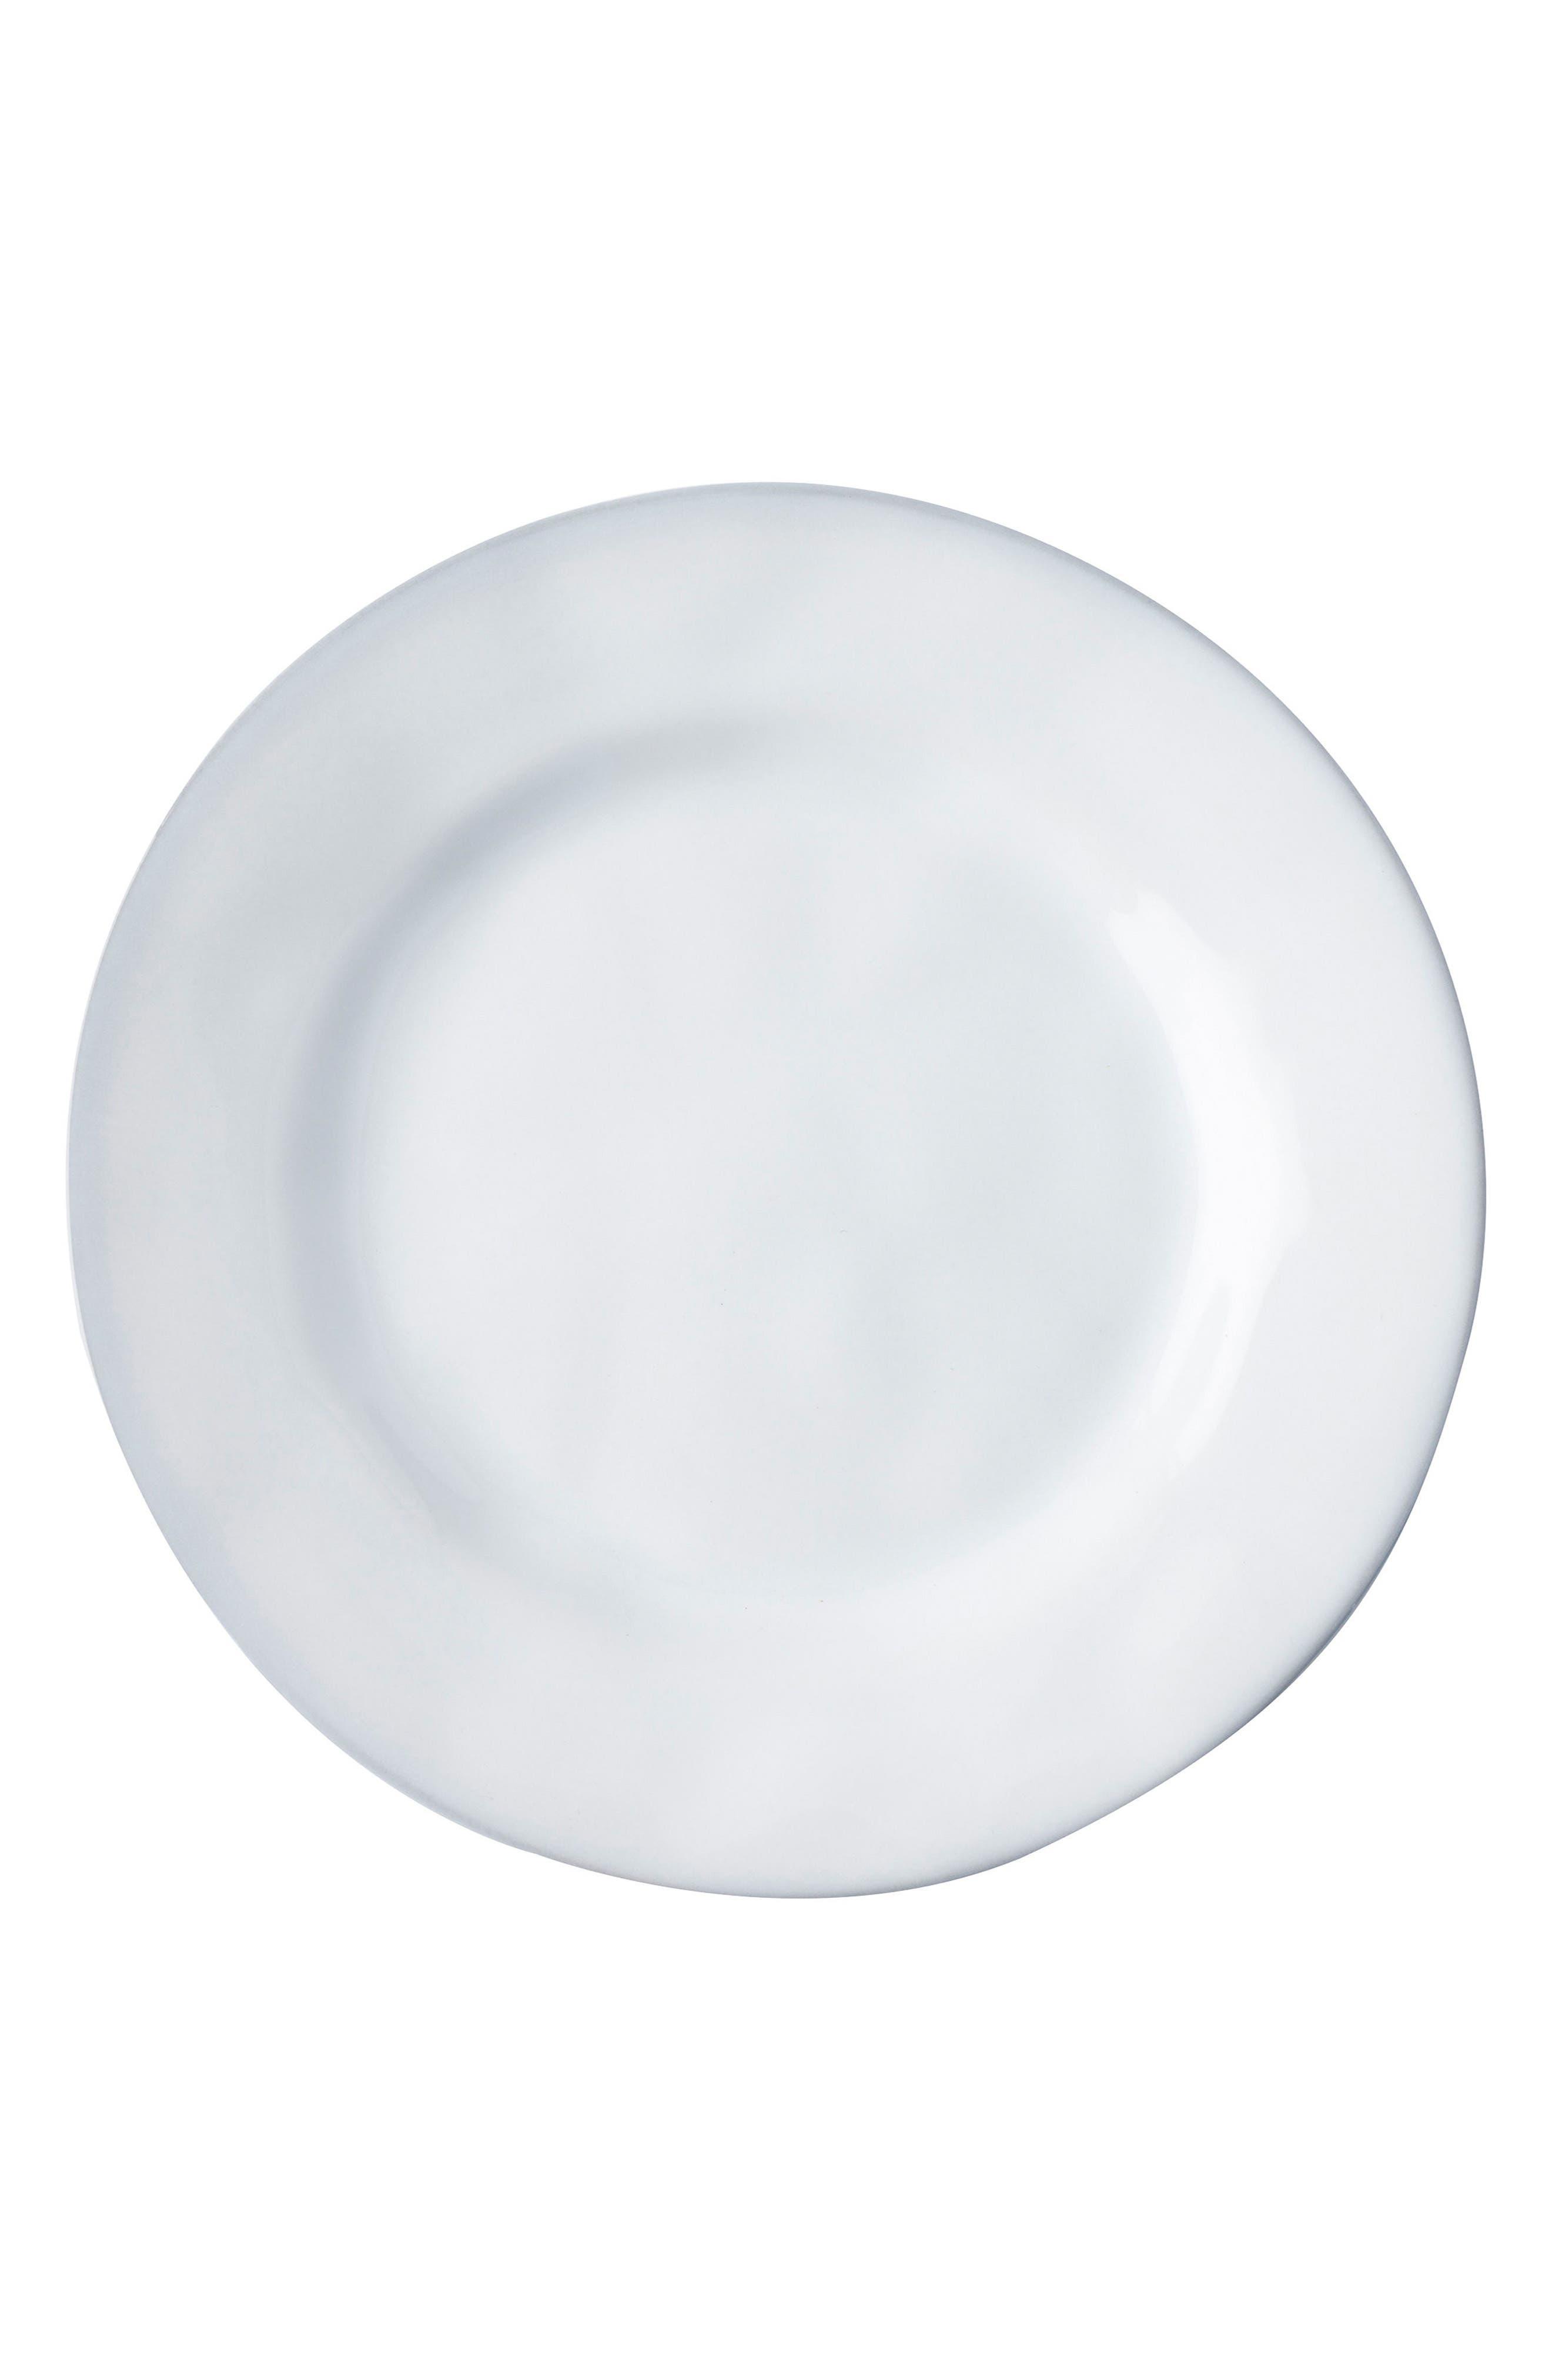 Quotidien White Truffle Ceramic Side Plate,                             Main thumbnail 1, color,                             White Truffle